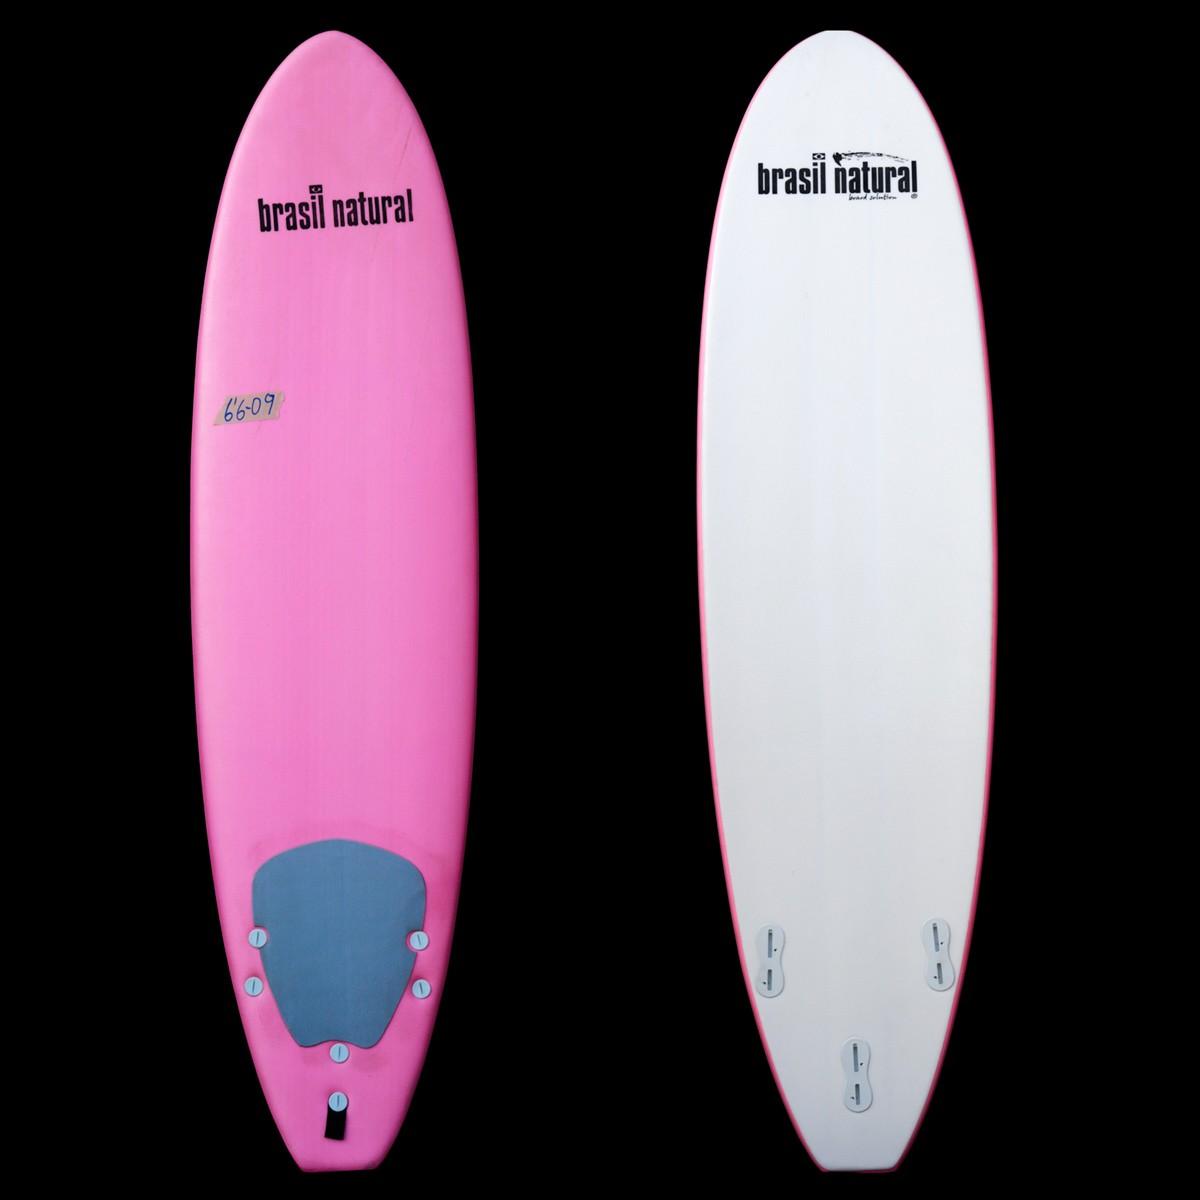 Prancha de surf infantil 6.6 NEW EDITION - OUTLET 09